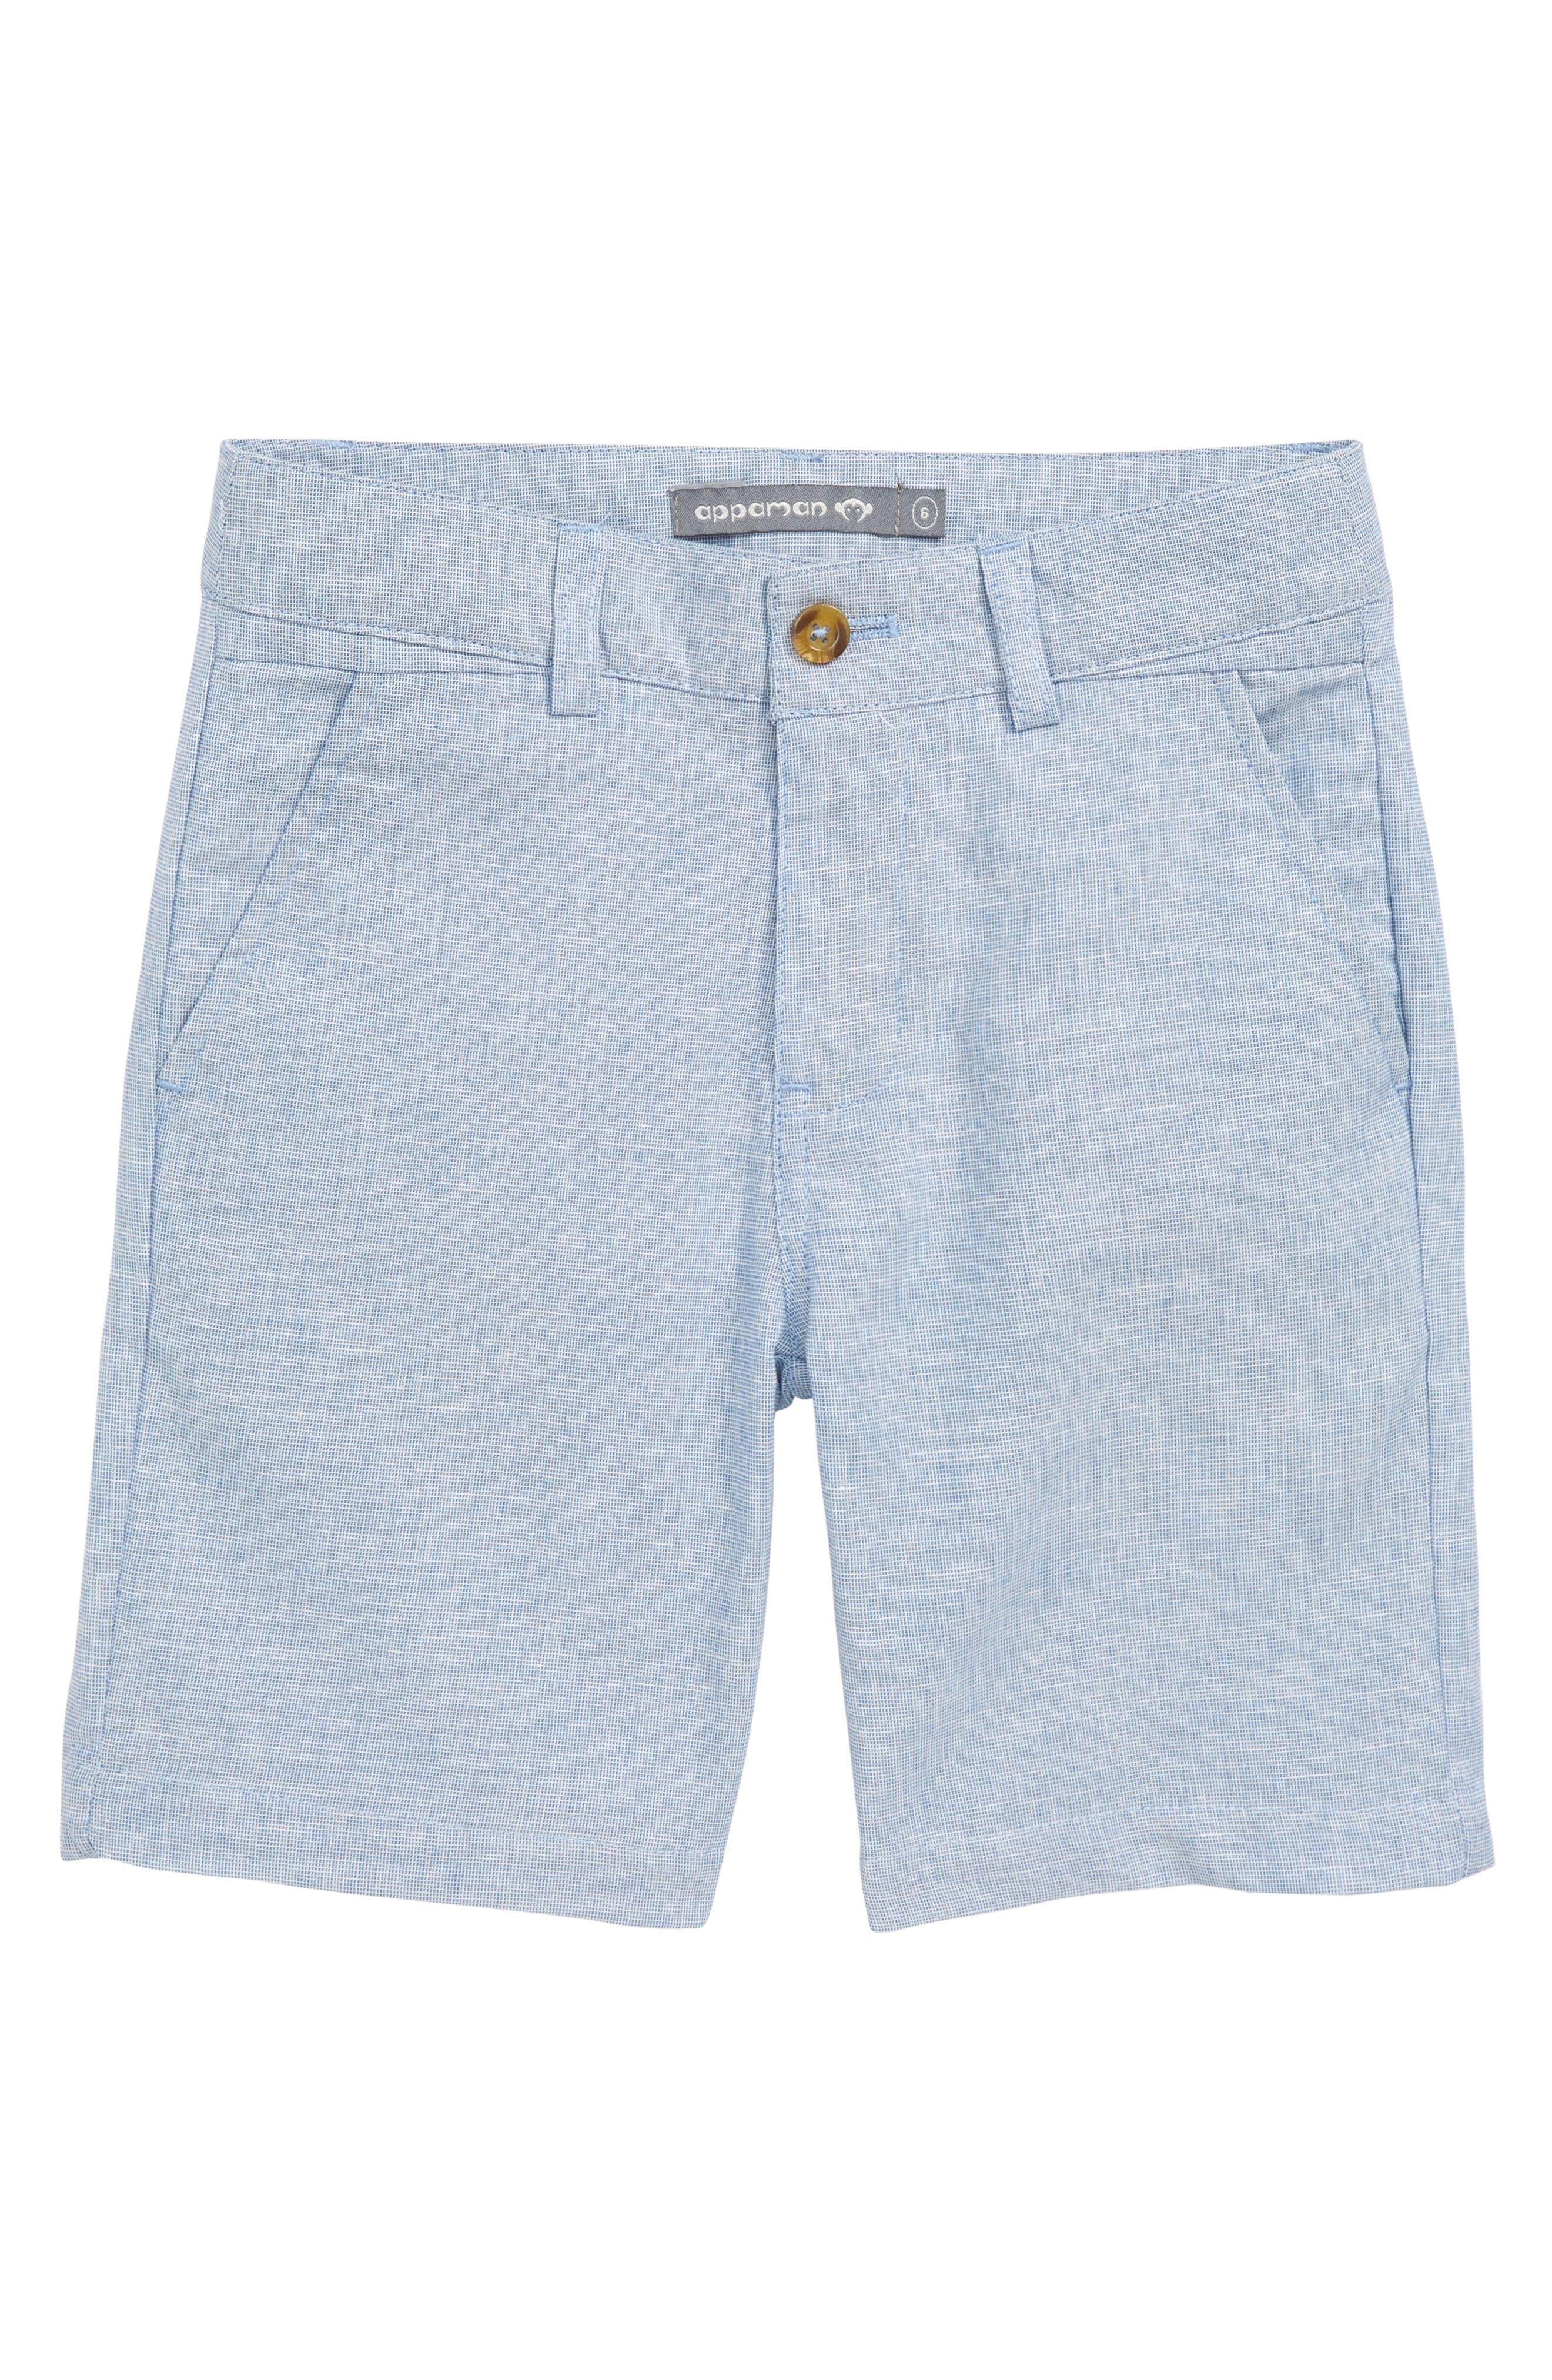 Trouser Shorts,                             Main thumbnail 1, color,                             Sky Club